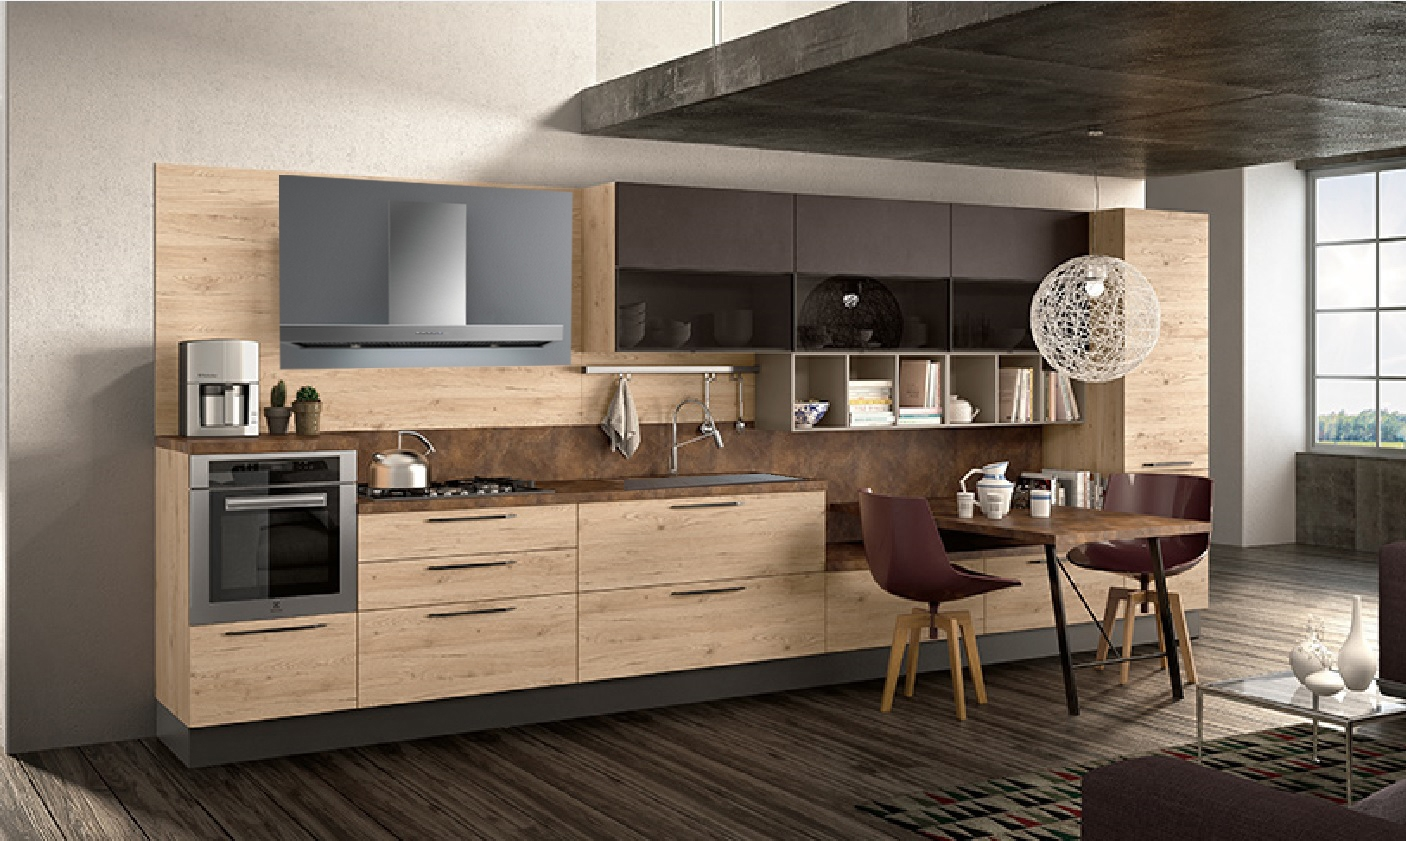 Cucina moderna lineare nature zen easy in offerta completa - Elettrodomestici cucina ...